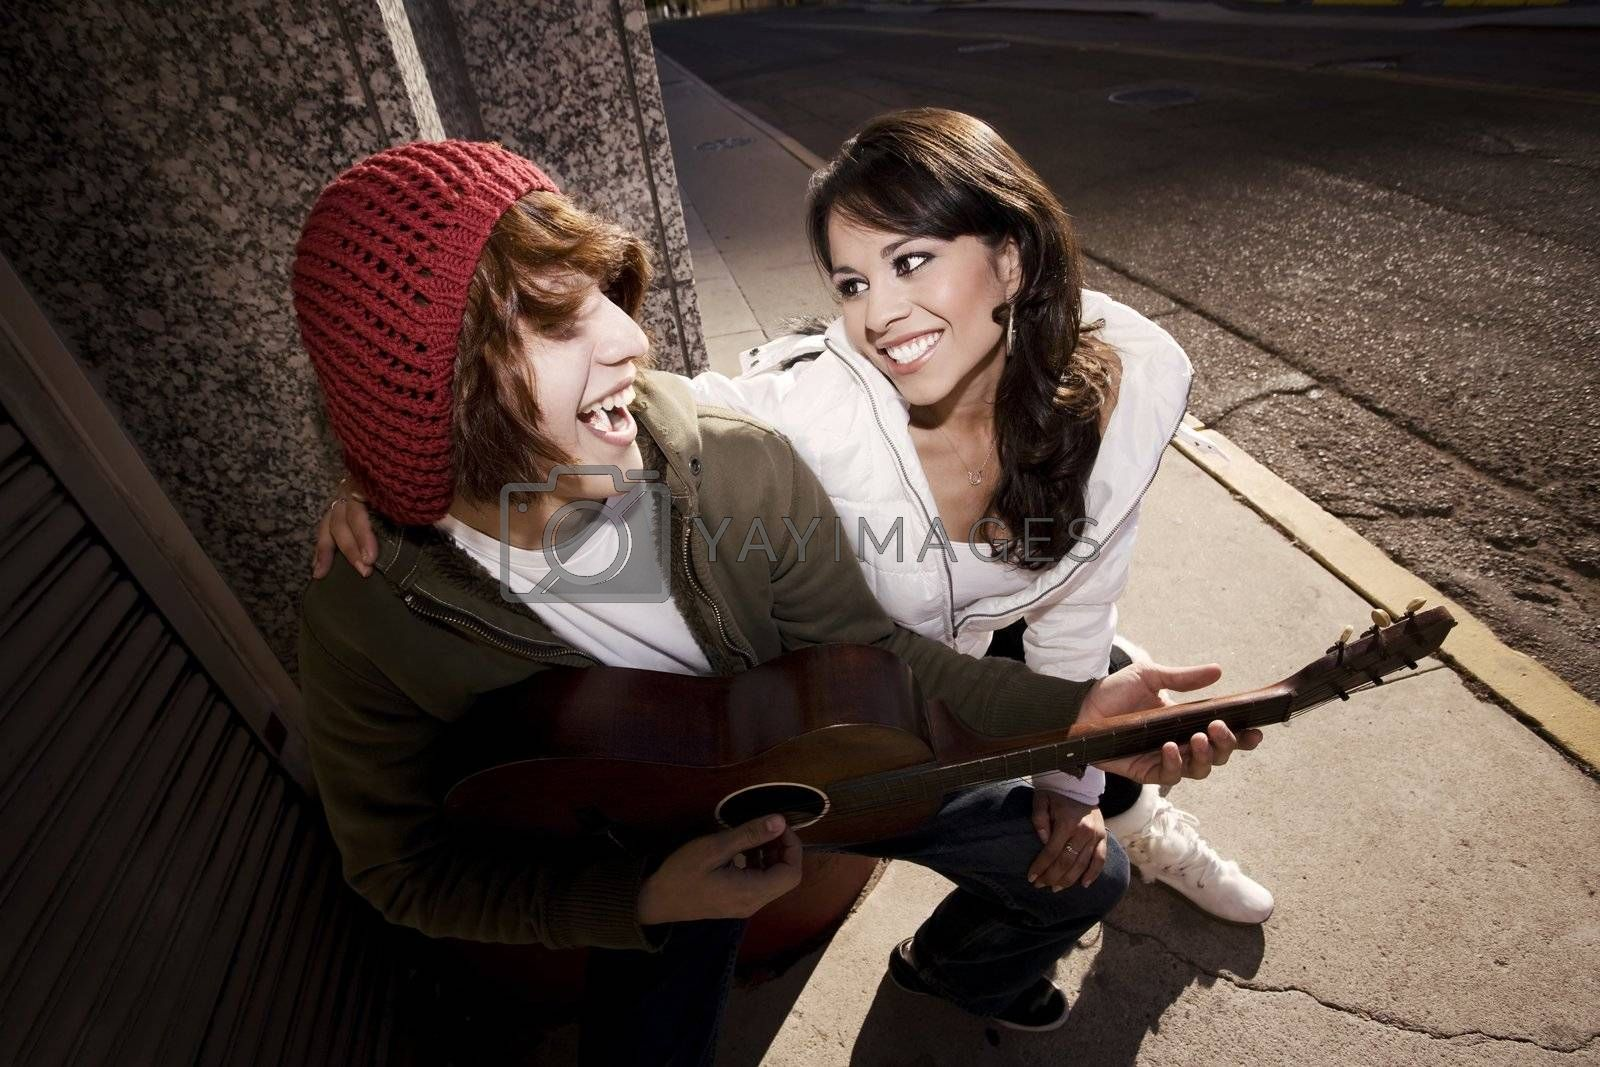 Hispanic musician and Latina Girlfriend downtown at sundown